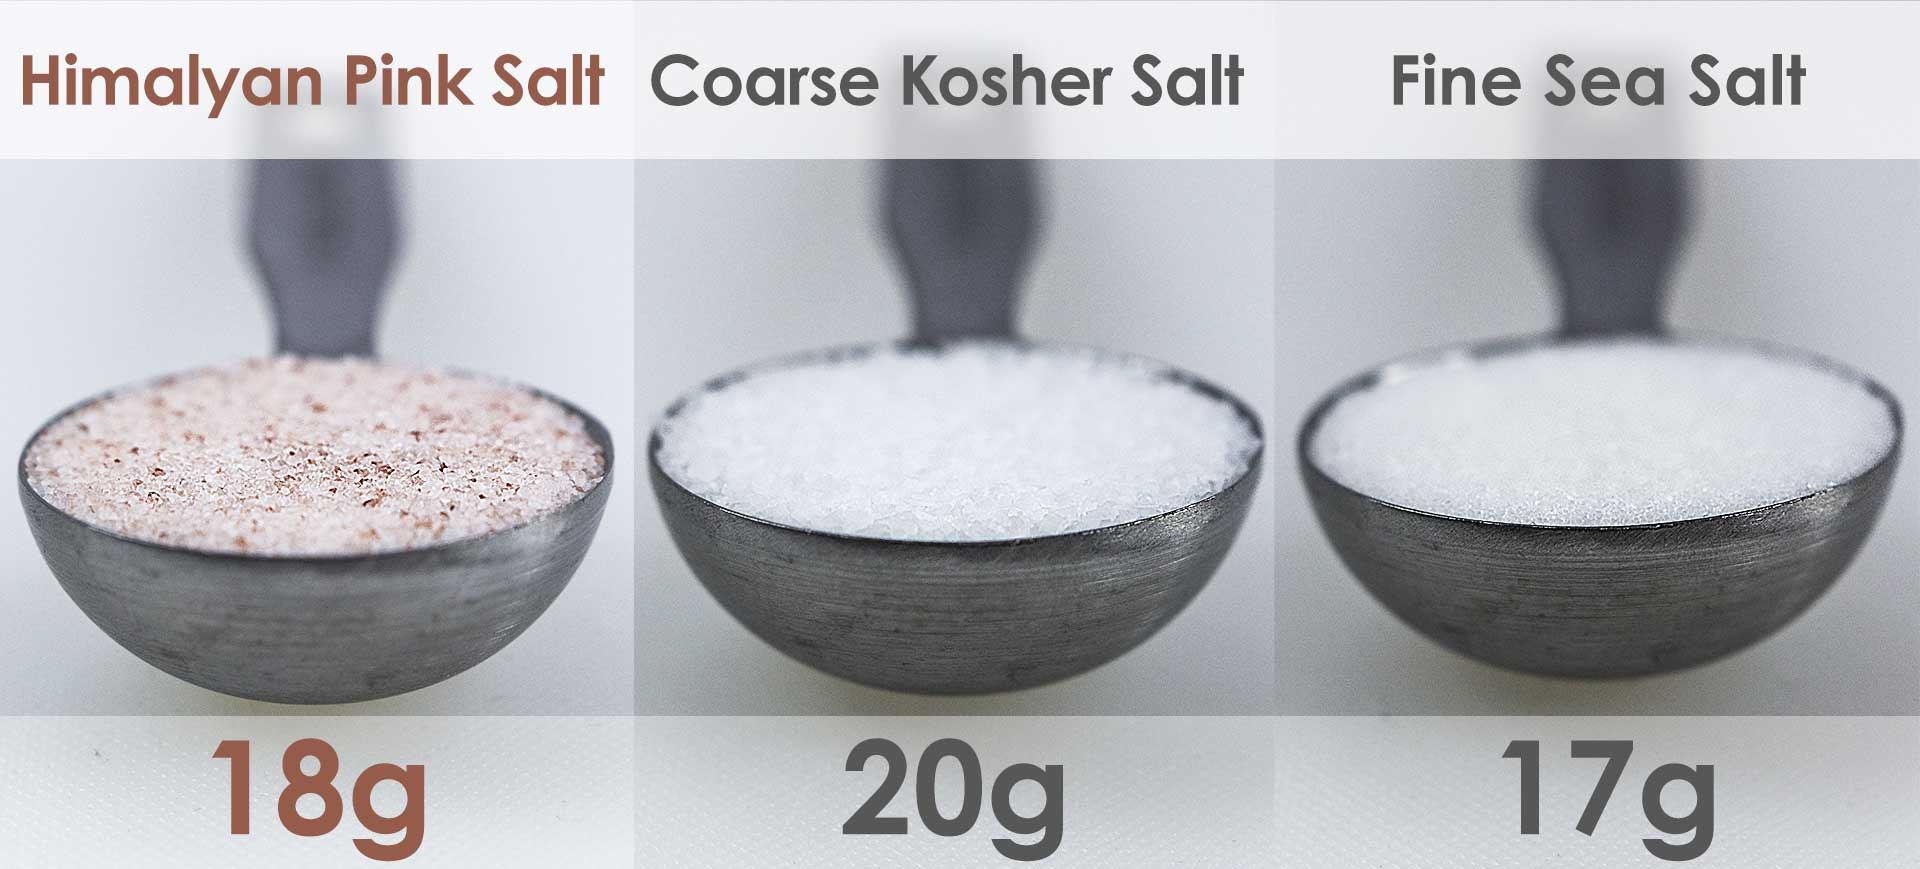 Tablespoons, Salt and Sauerkraut - The Measuring Problem - Secrets